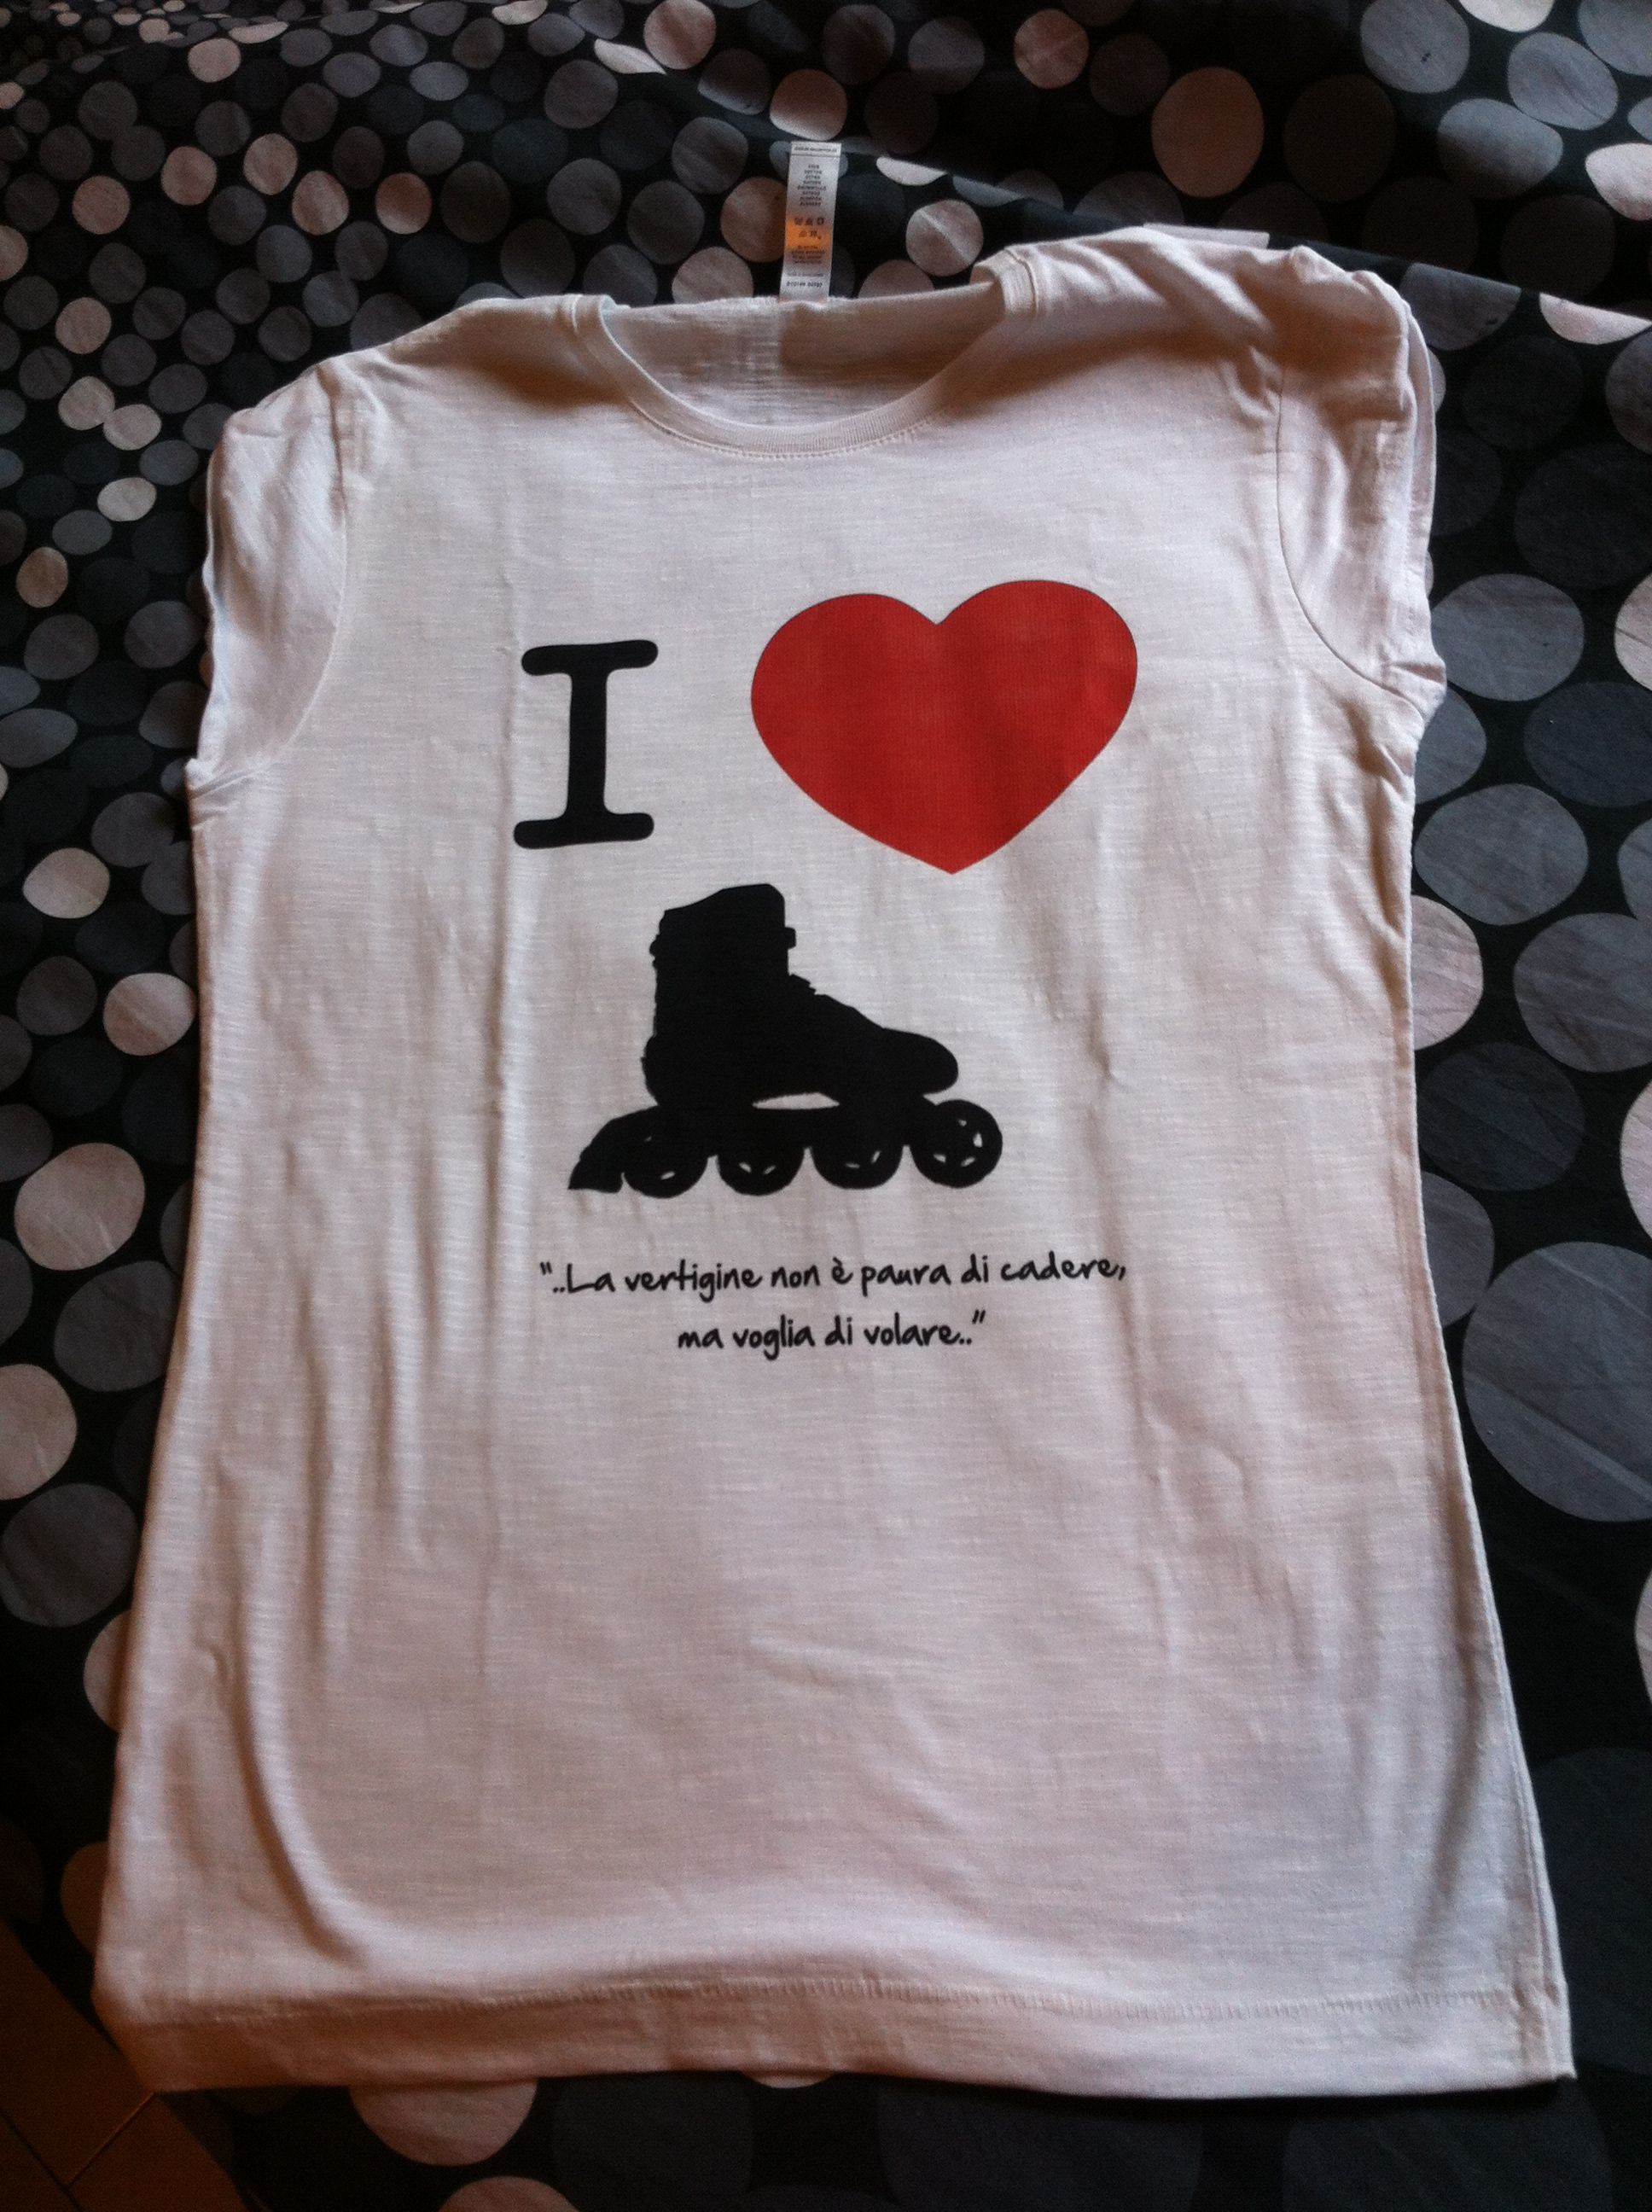 Design t shirt rollerblade -  Rollerblade Love Tshirt Wishlist Wishlist Wishlist